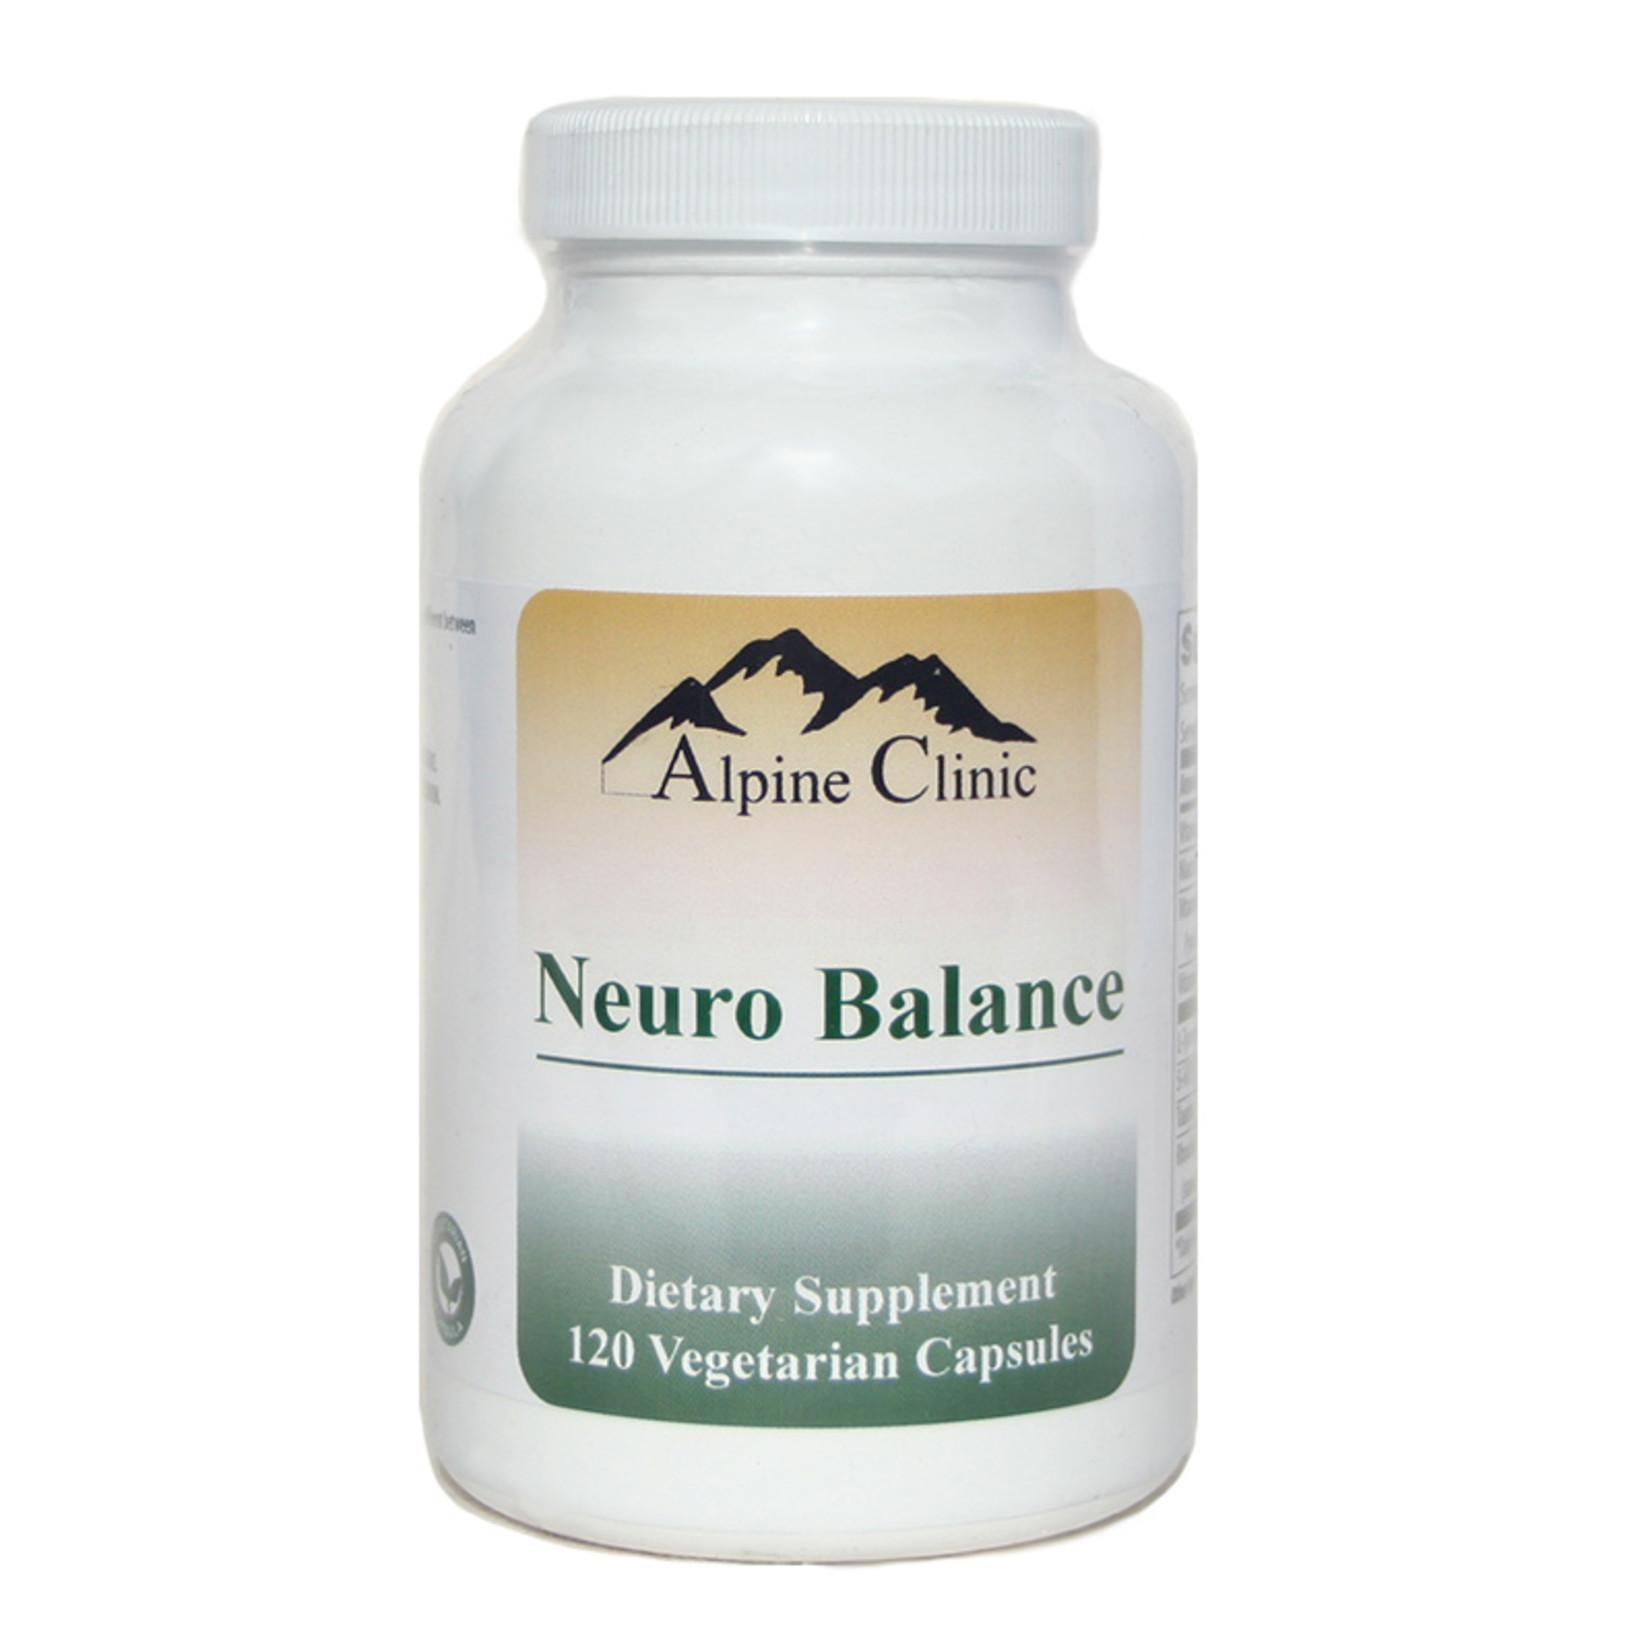 Alpine Clinic PL Neuro Balance